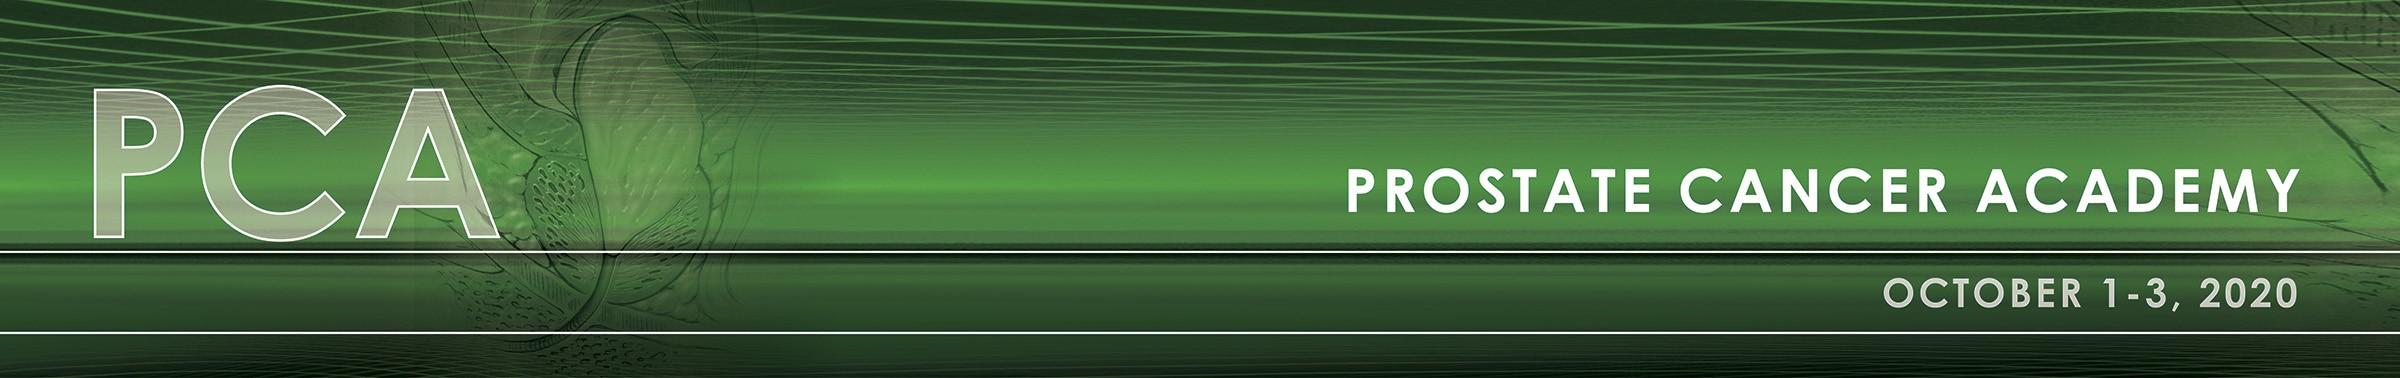 PCA header